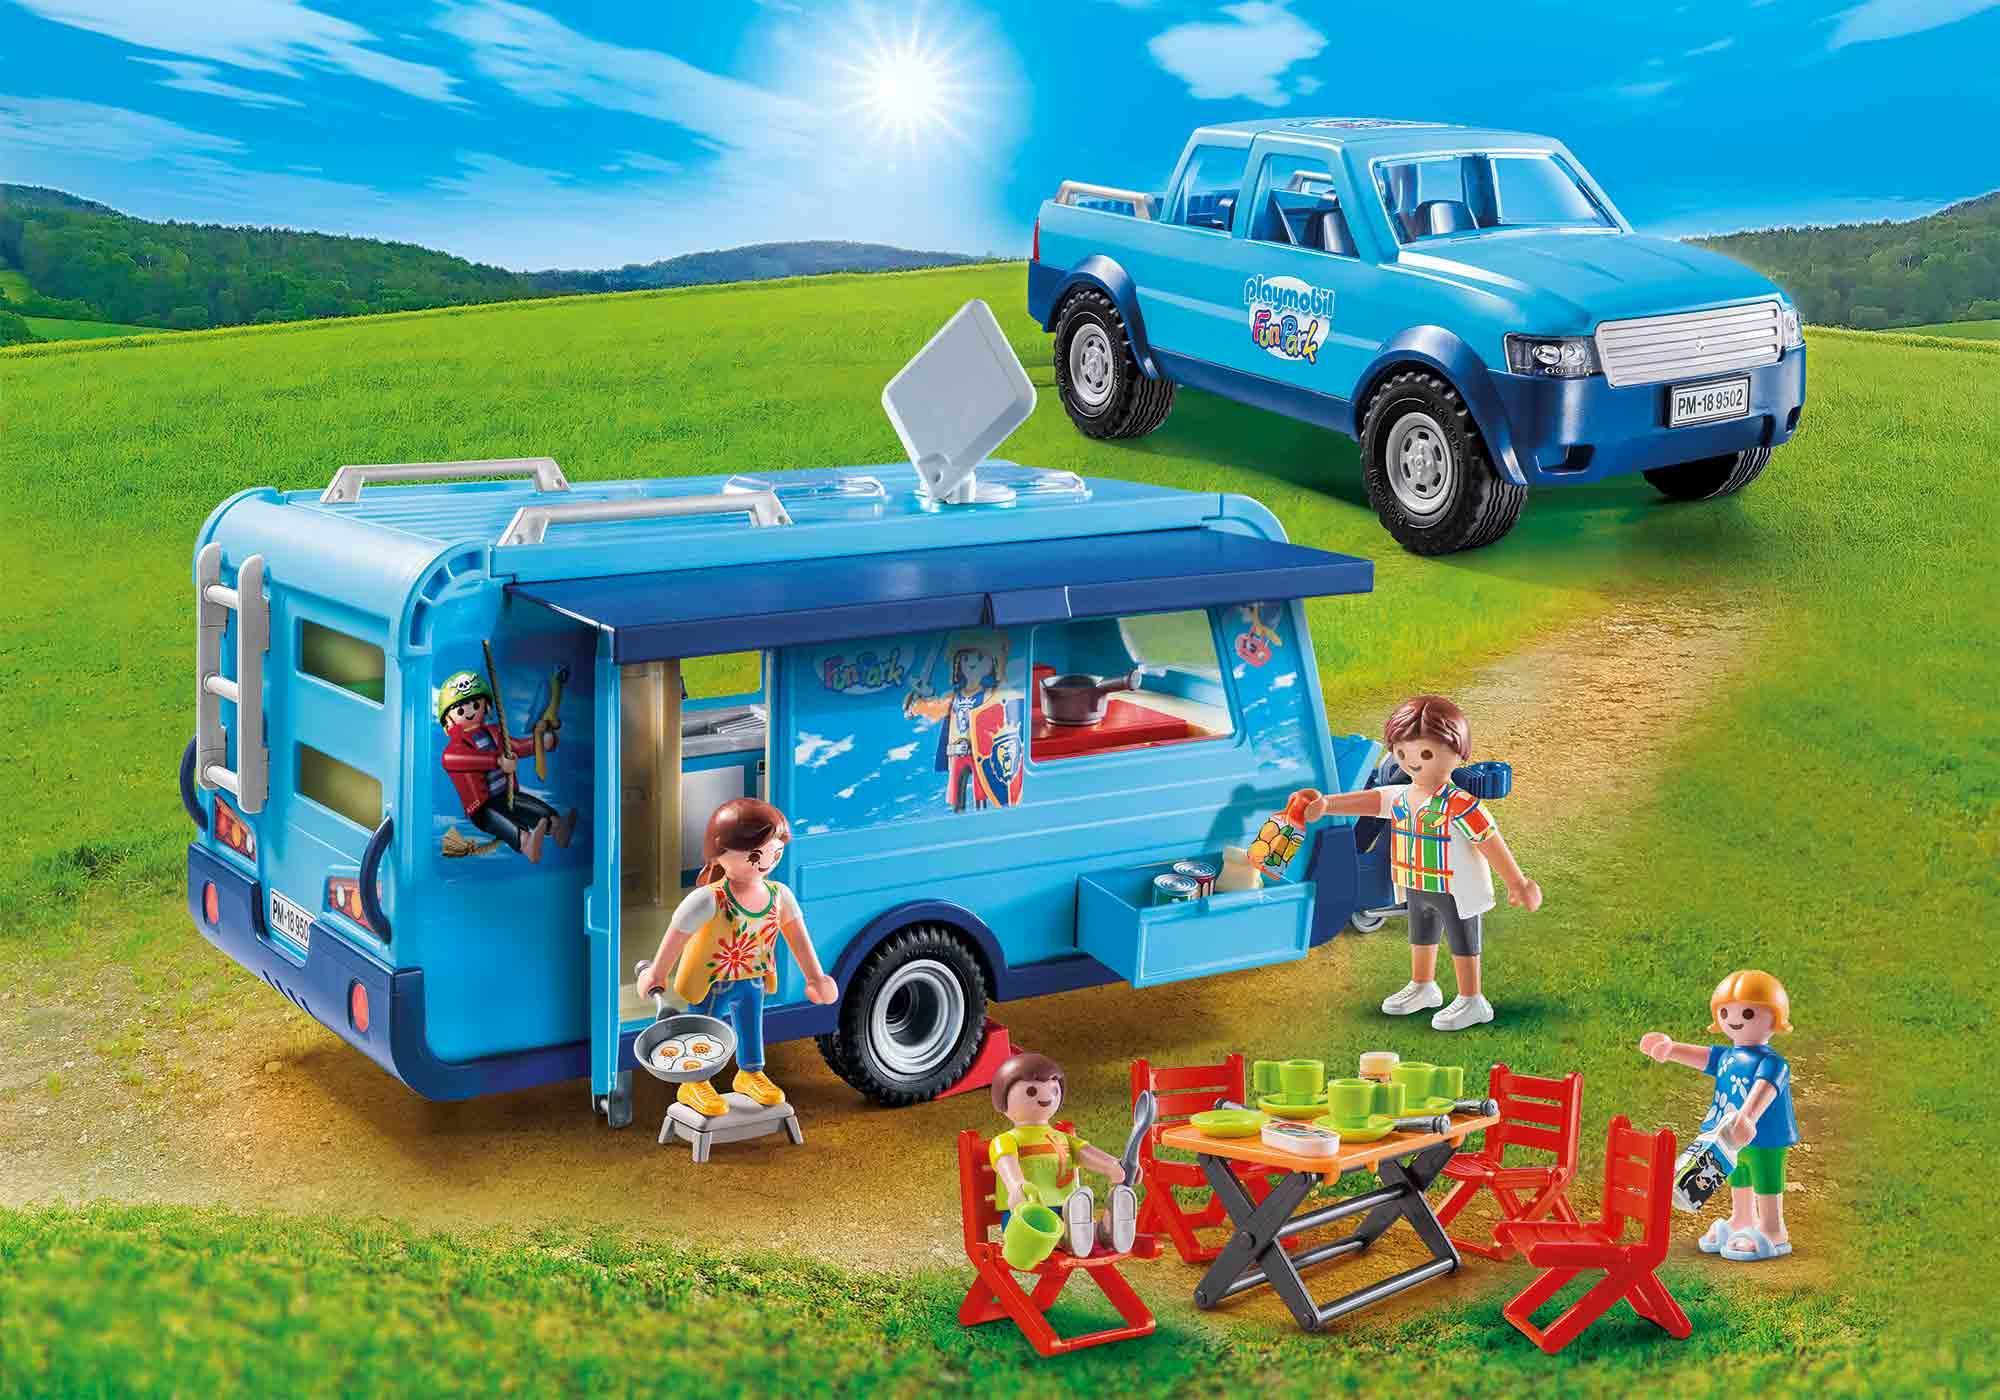 9502_product_detail/Playmobil-Pick-Up mit Wohnwagen